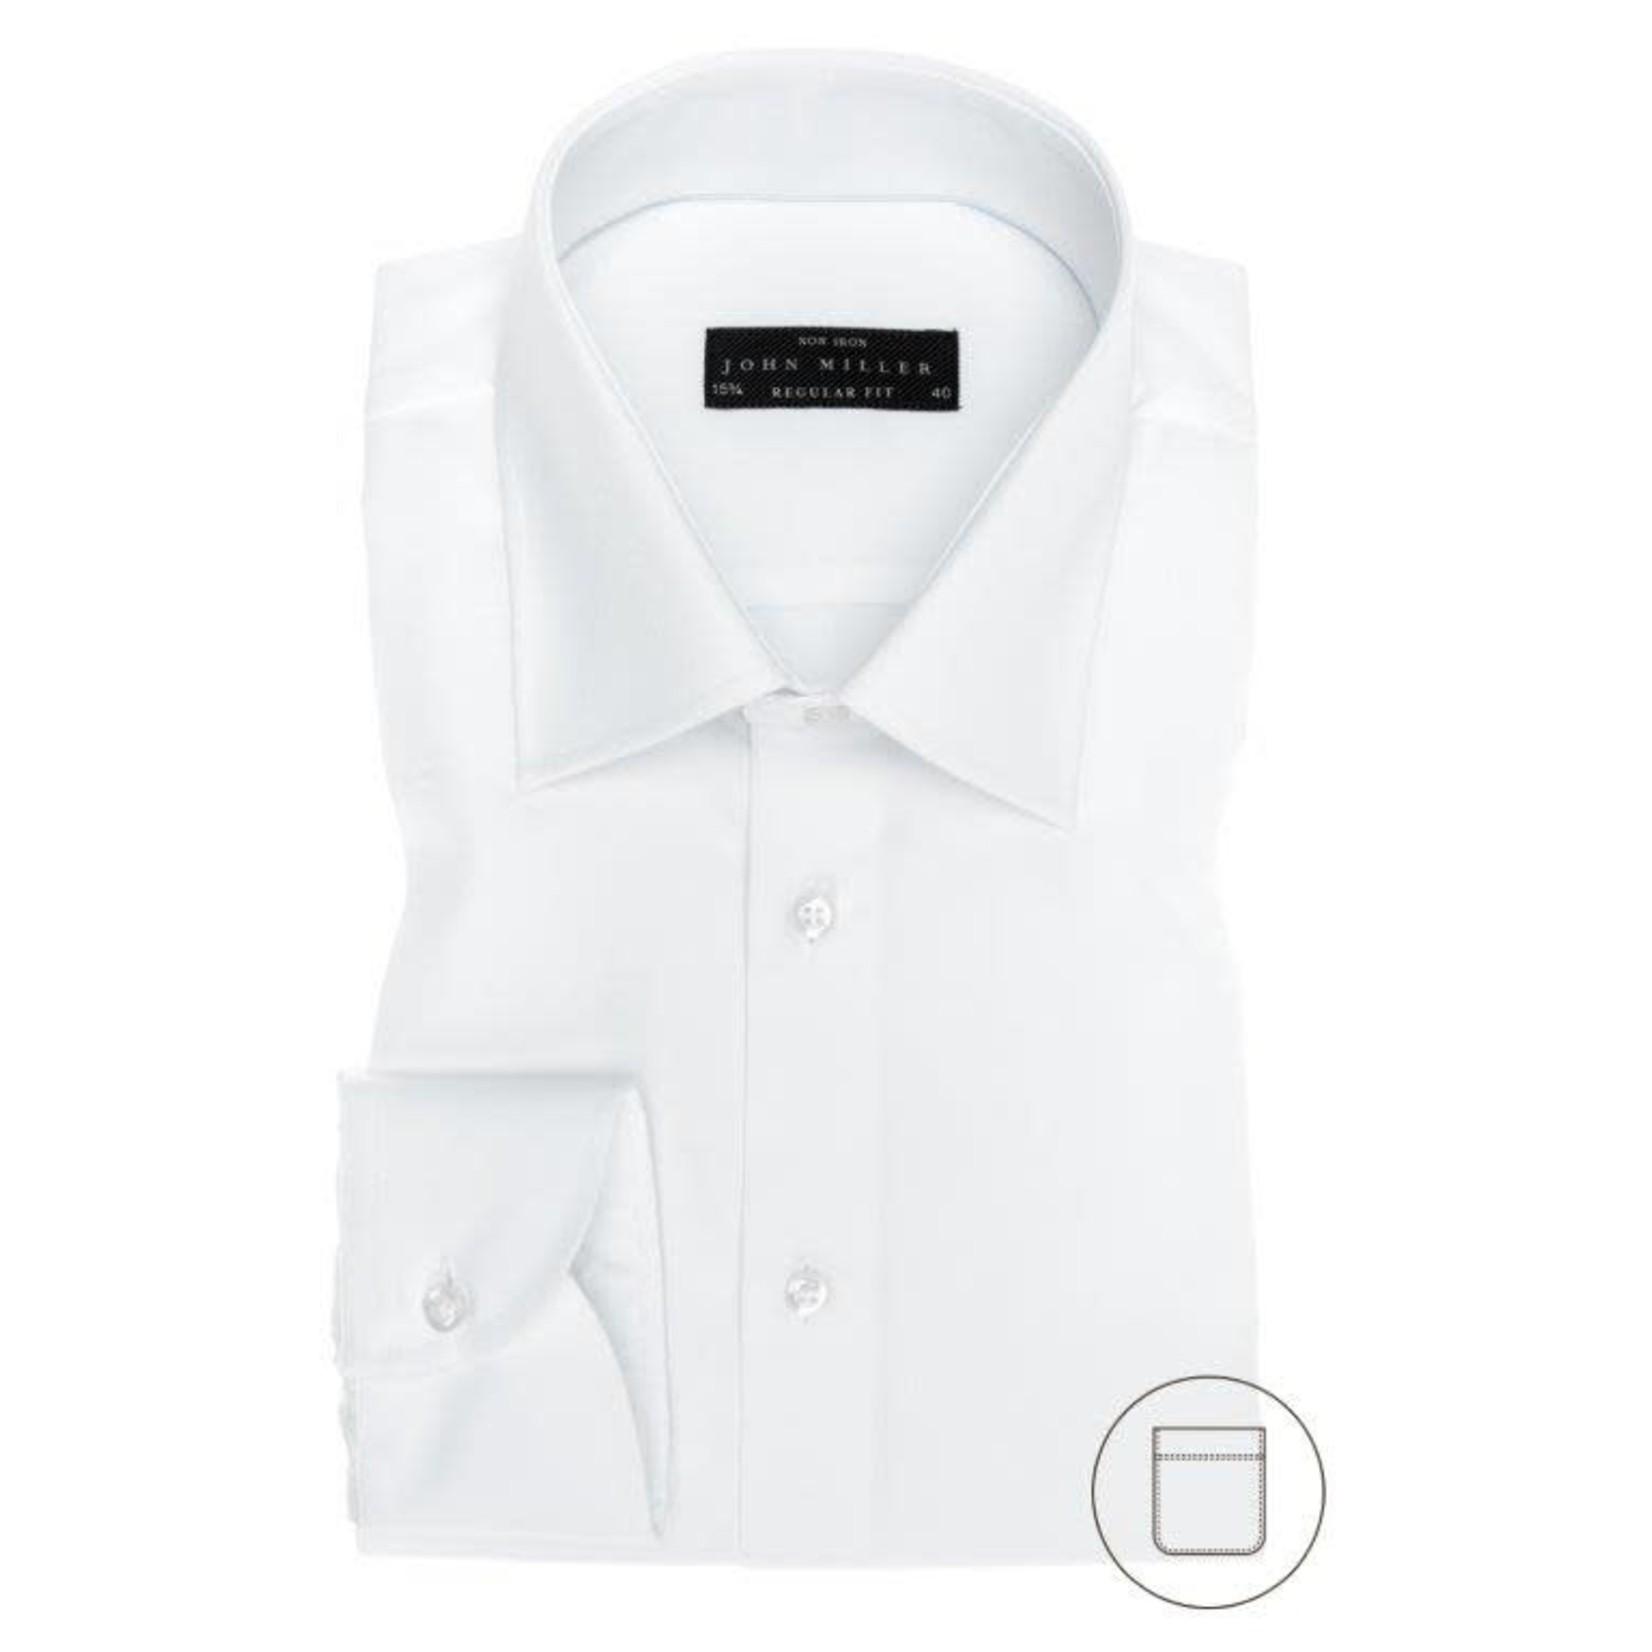 John Miller regular fit overhemd wit met semi spread boord